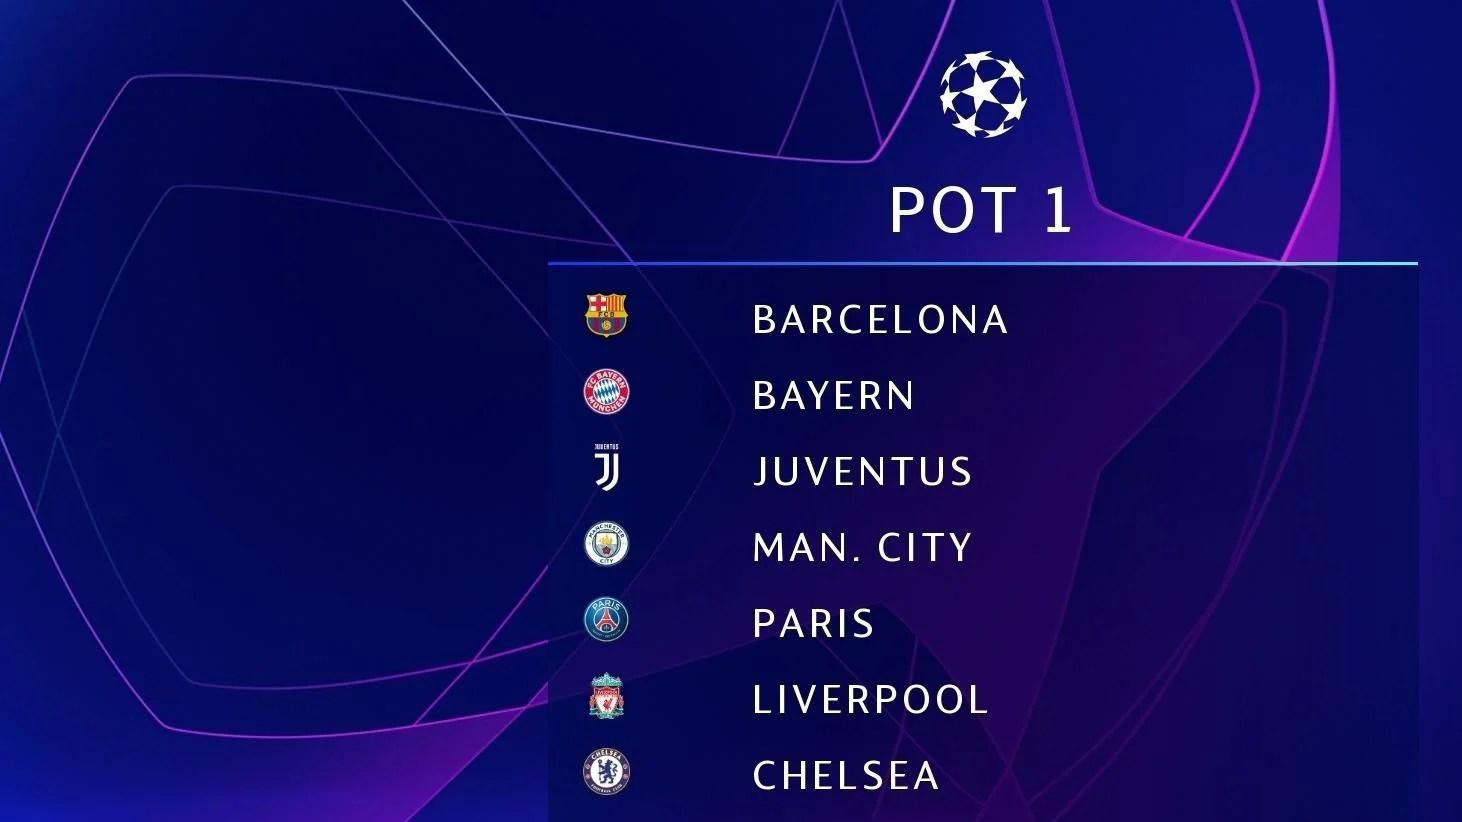 Champions League group stage draw: Pot 1   UEFA Champions League   UEFA.com